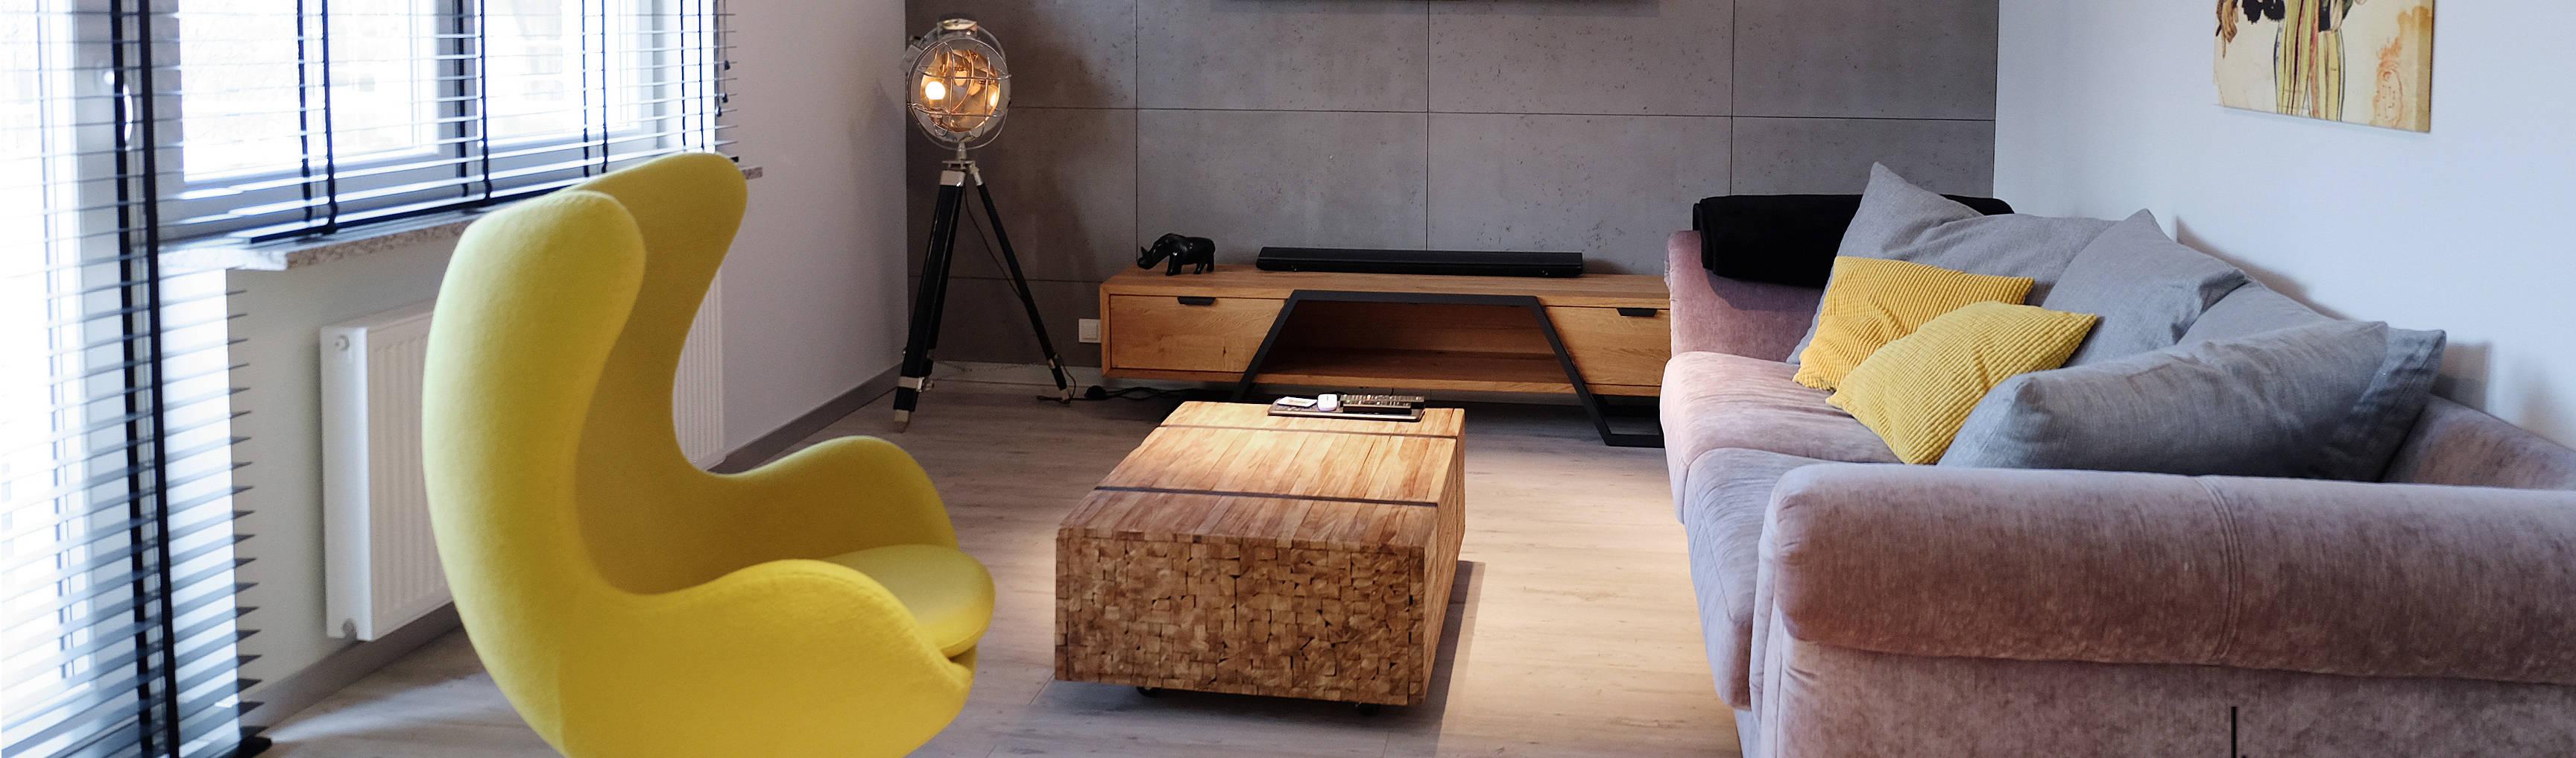 studio projektowe KODA design Dawid Kotuła